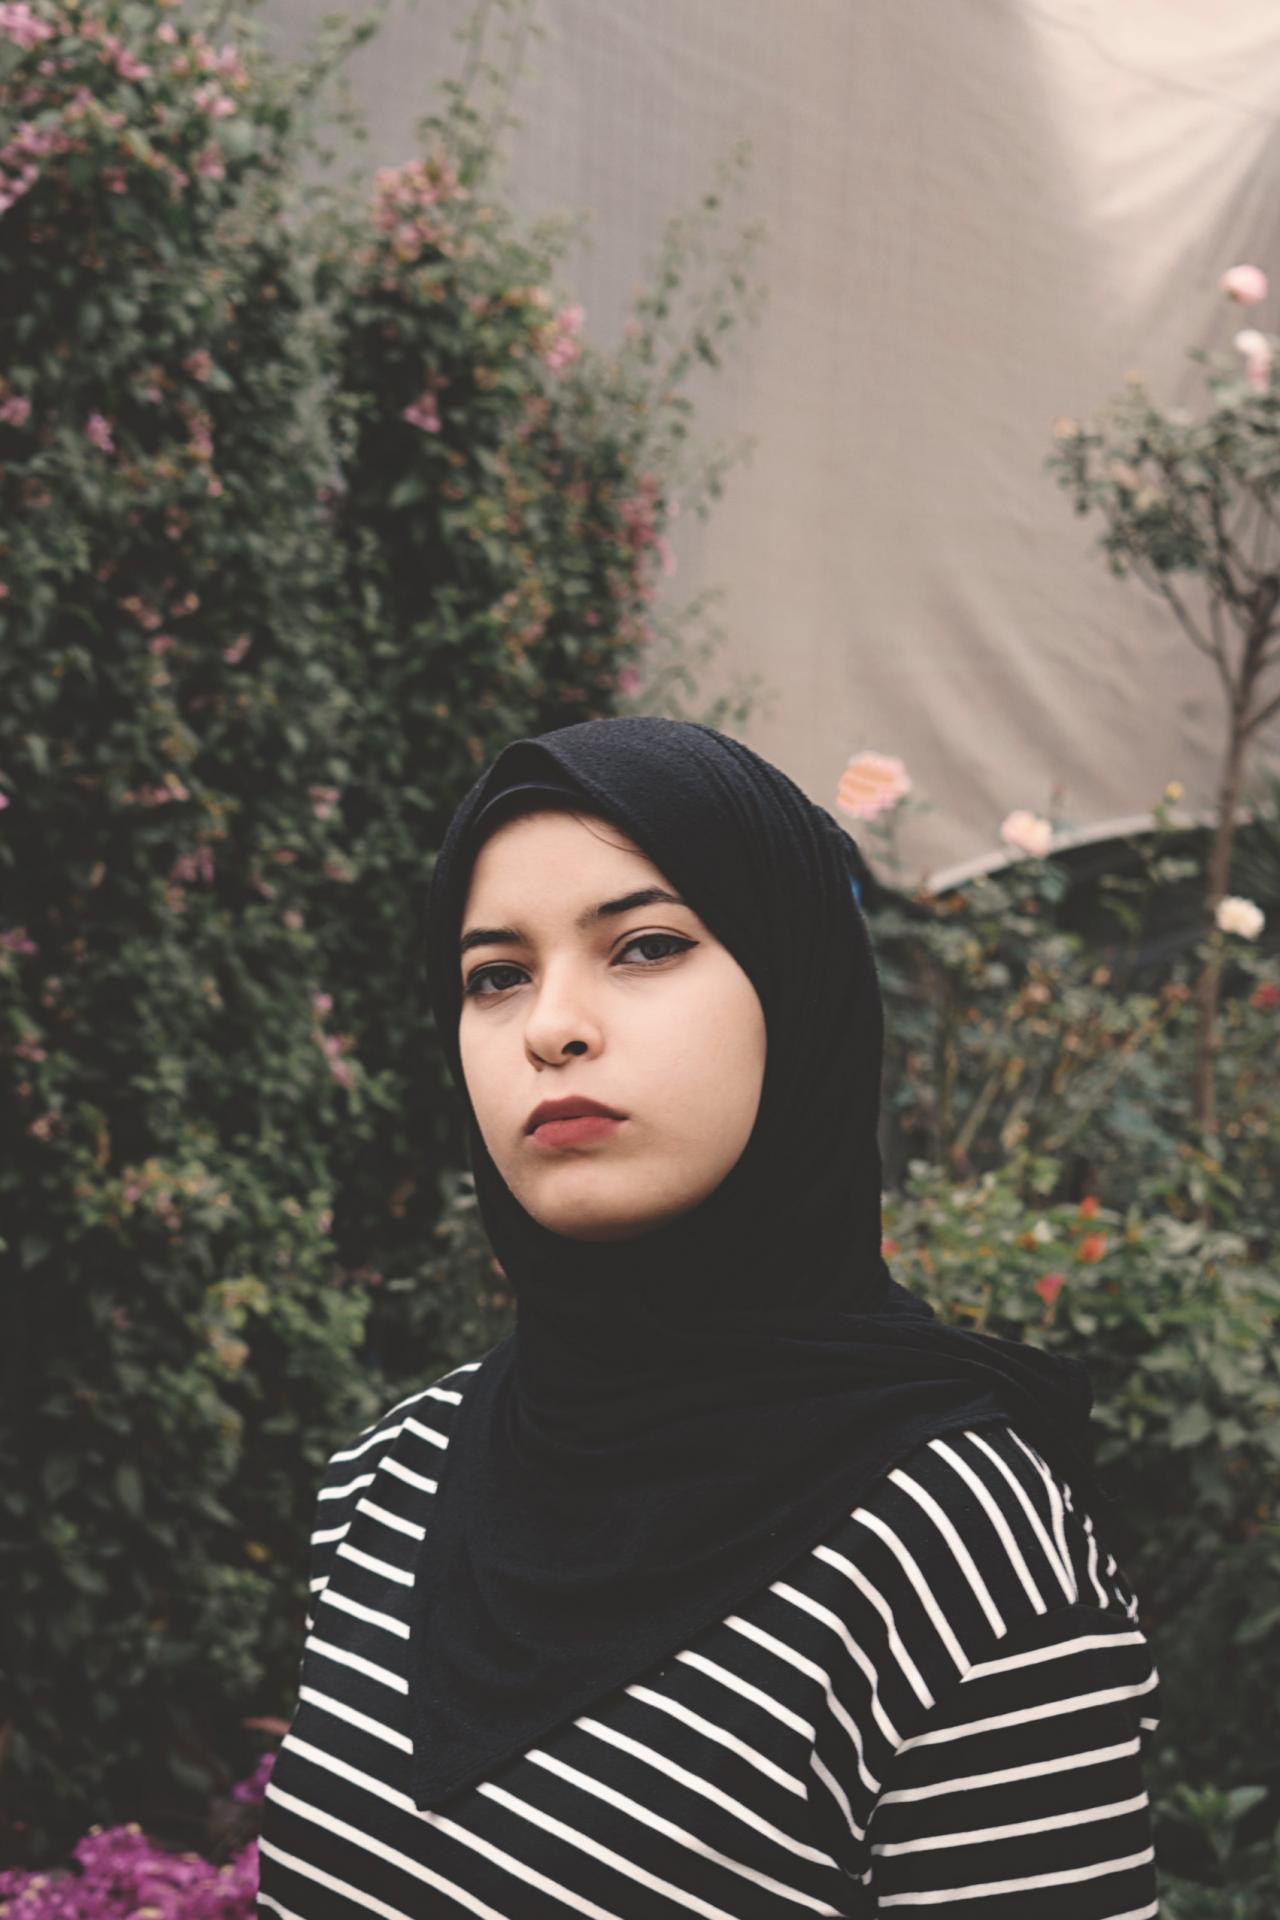 https://jooinn.com/images1280_/woman-wearing-black-veil-3.jpg